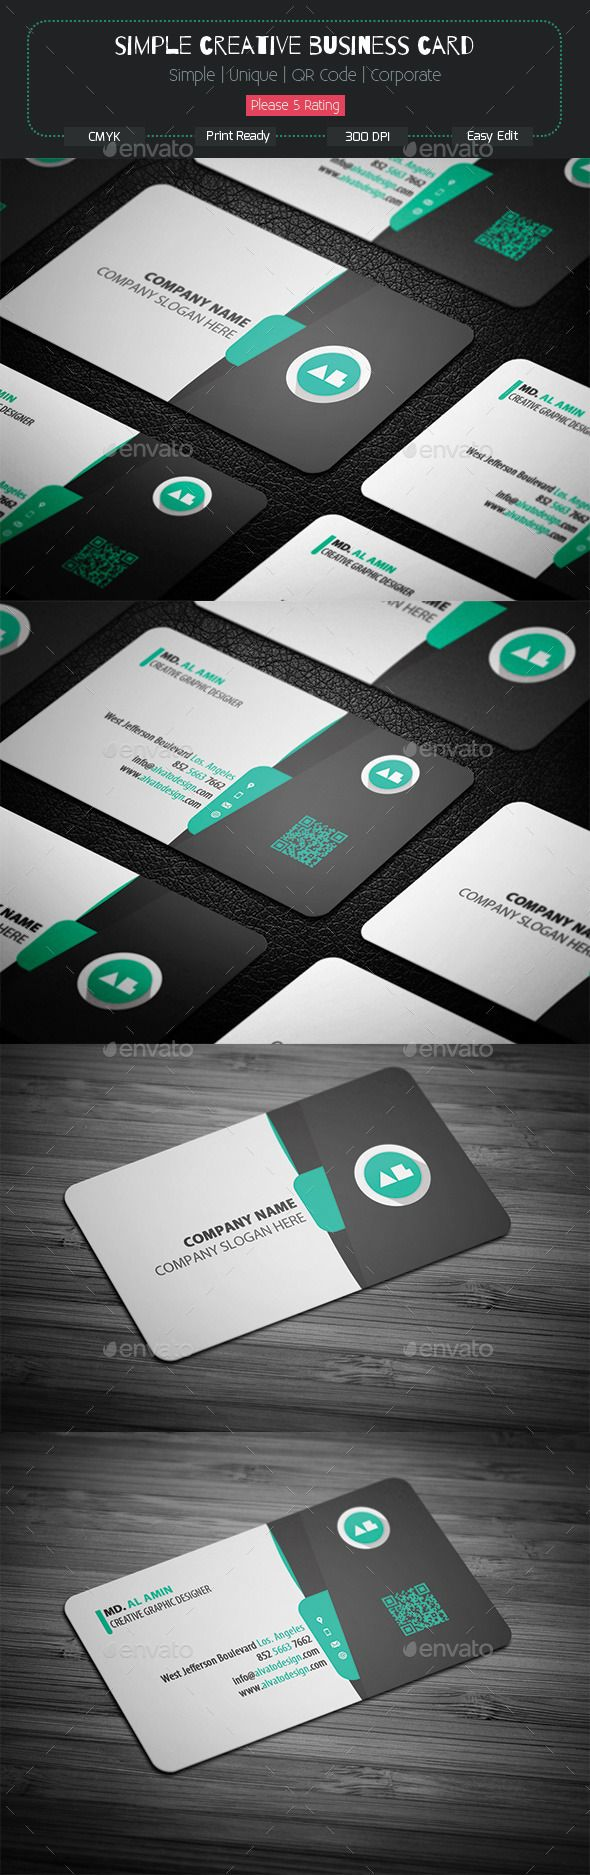 Best 20 Ernesto Brand Ideas On Pinterest Business Cards Corporate